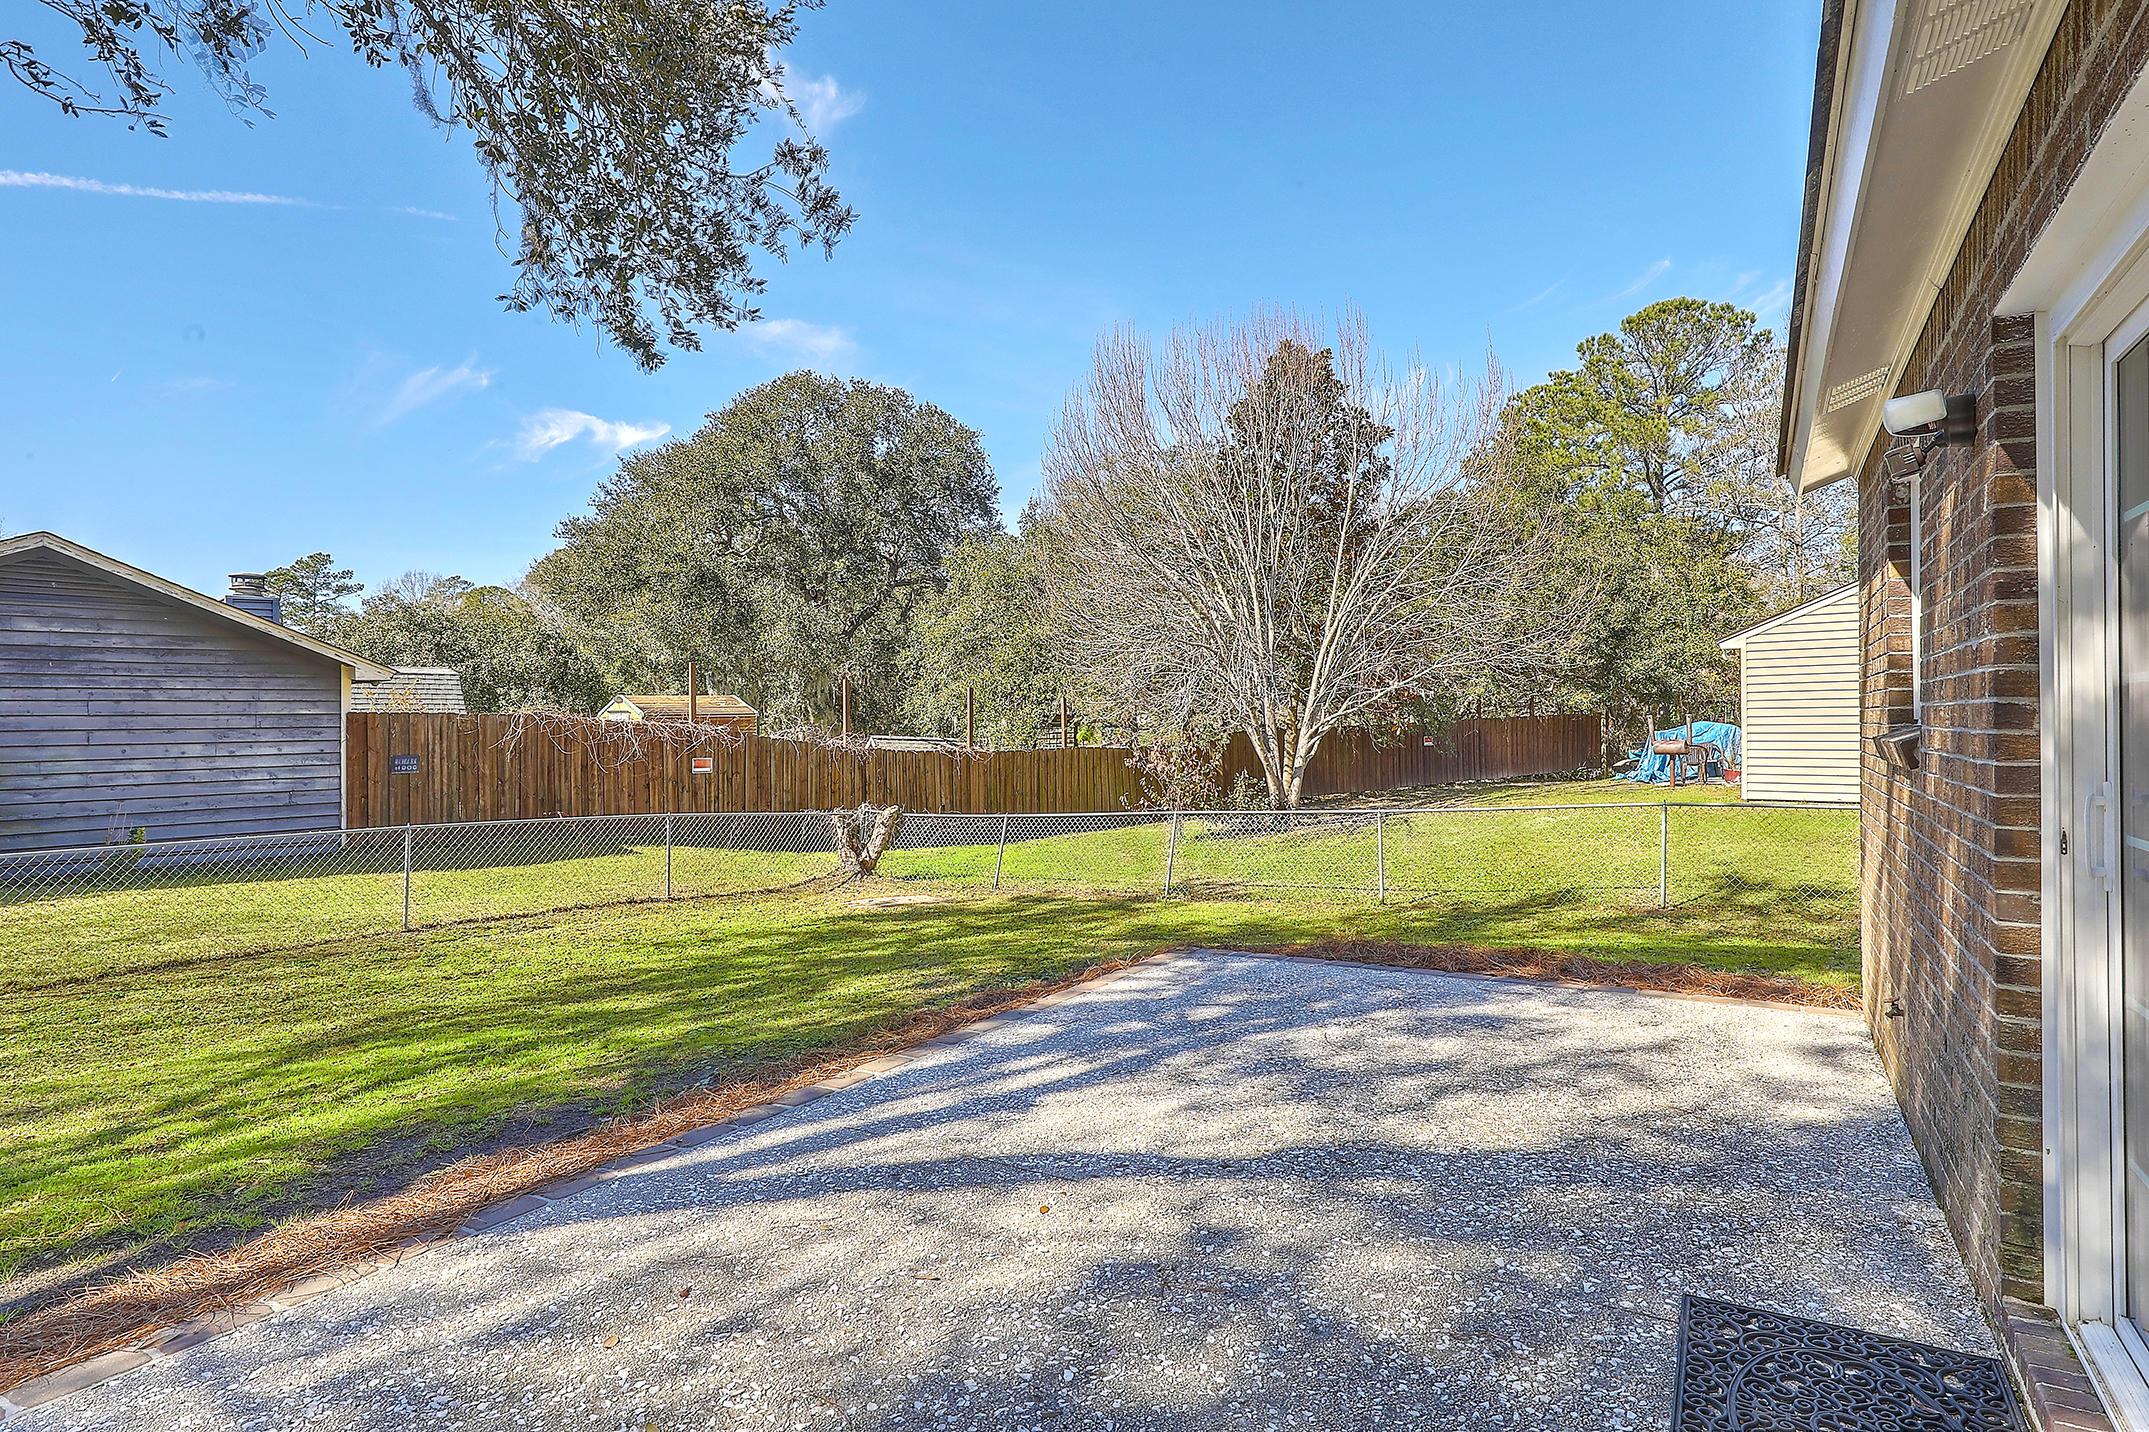 Oakland Homes For Sale - 281 Shore, Charleston, SC - 2